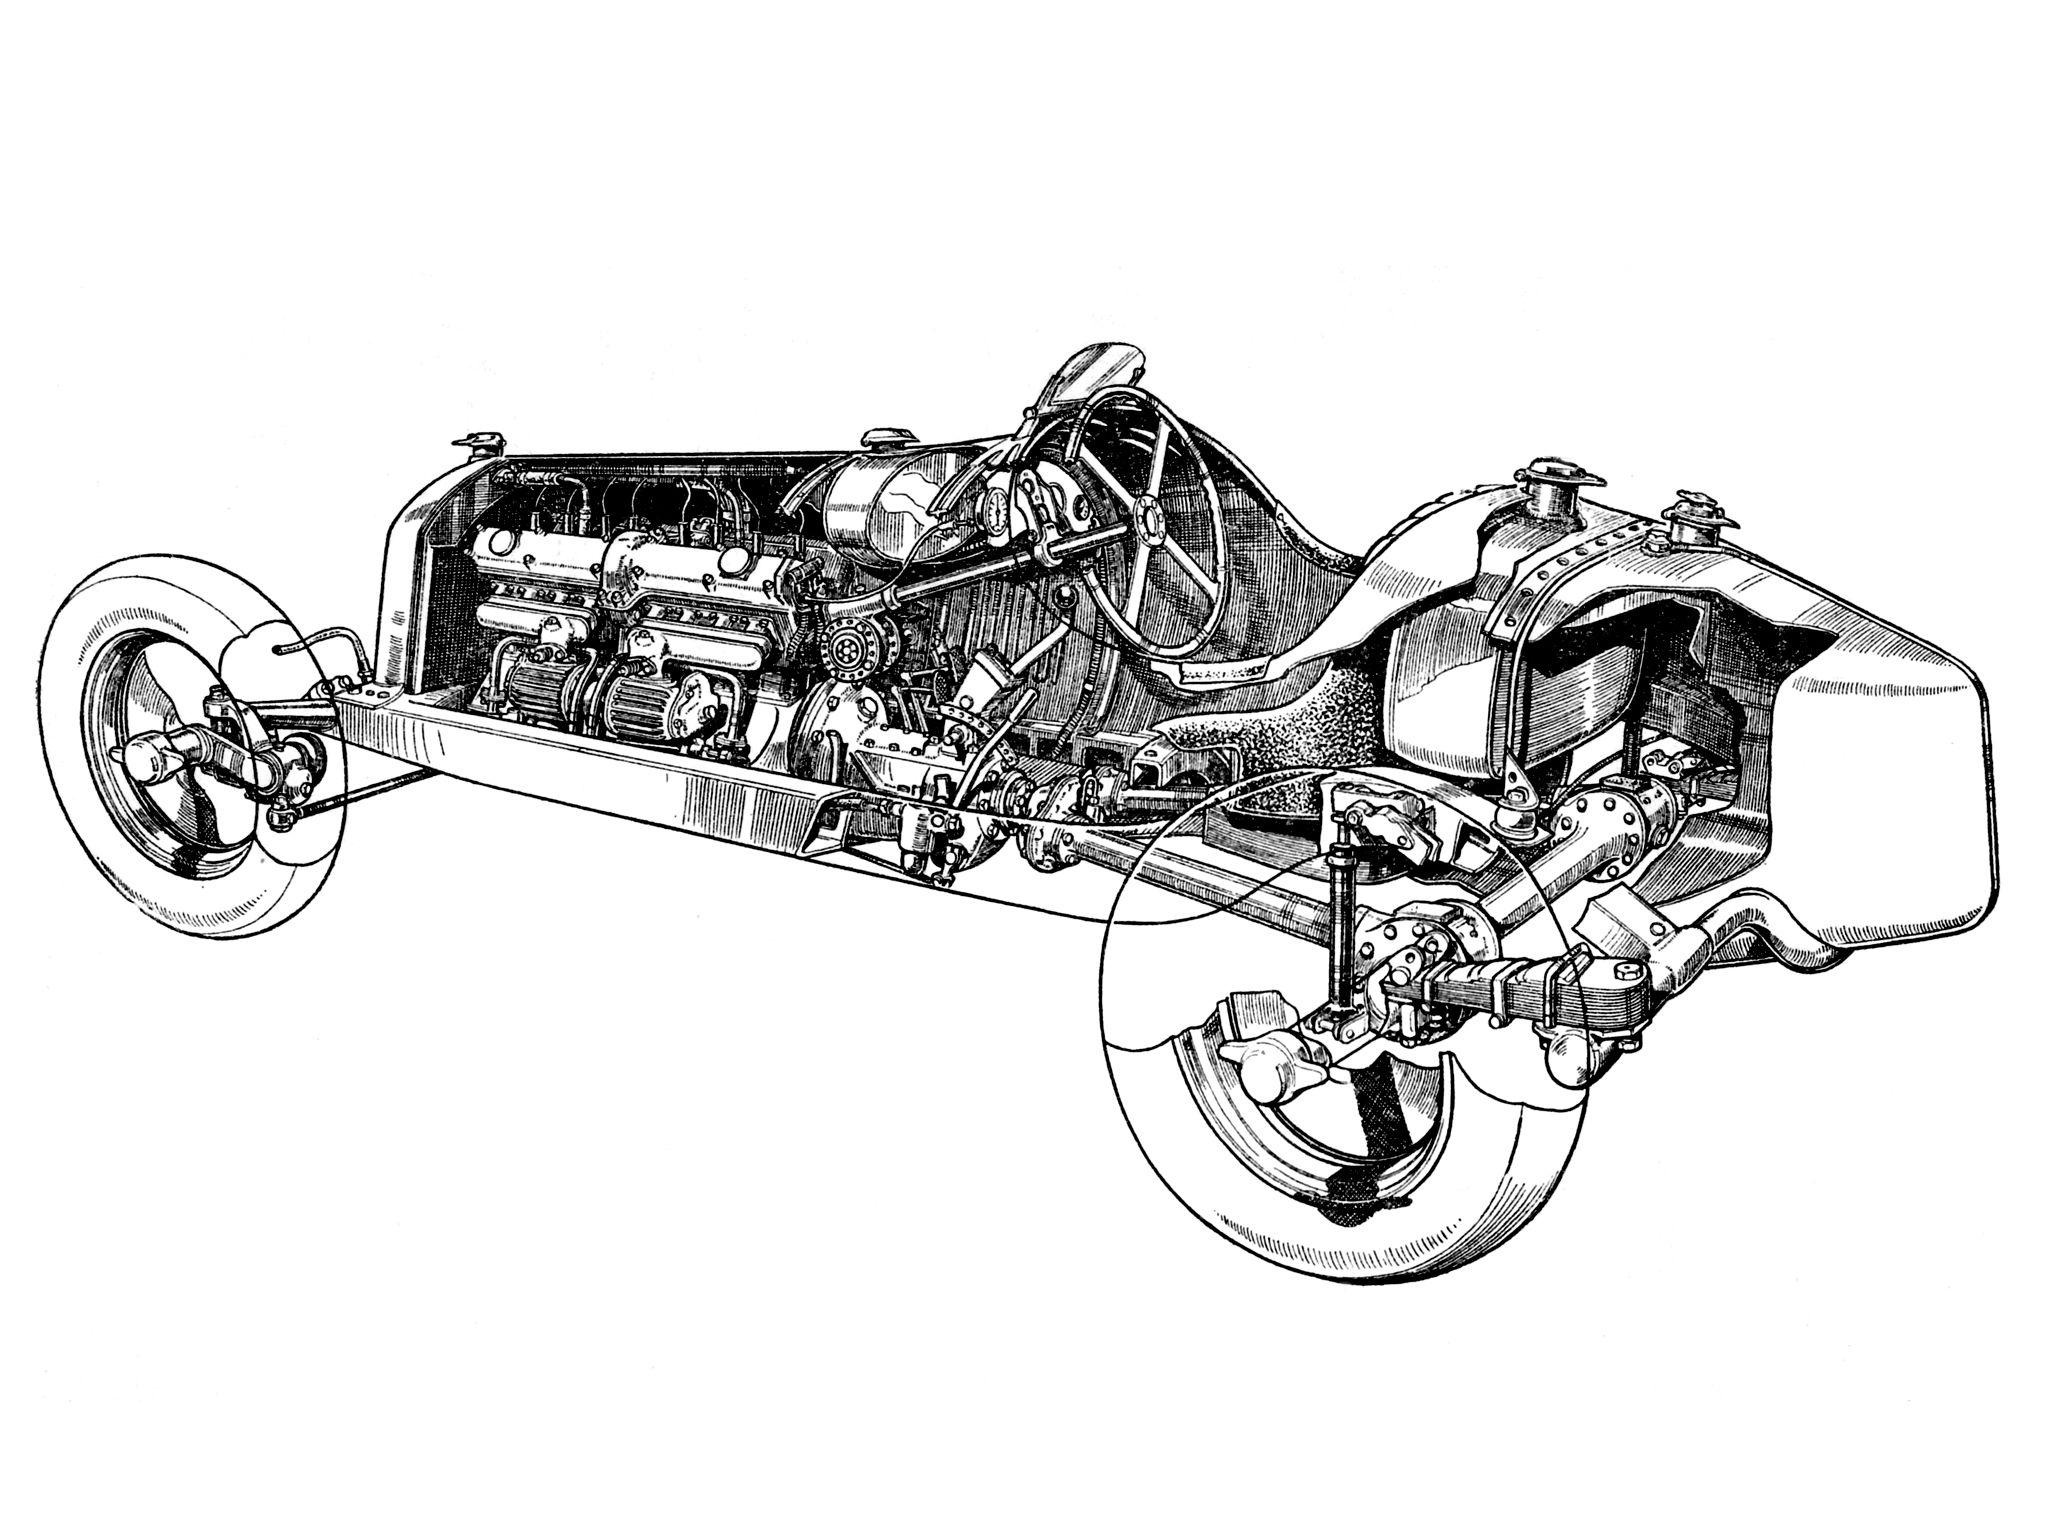 Engine Cutaway Wallpaper Tractor Wiring And Fuse Box Diagrams Alfa Romeo